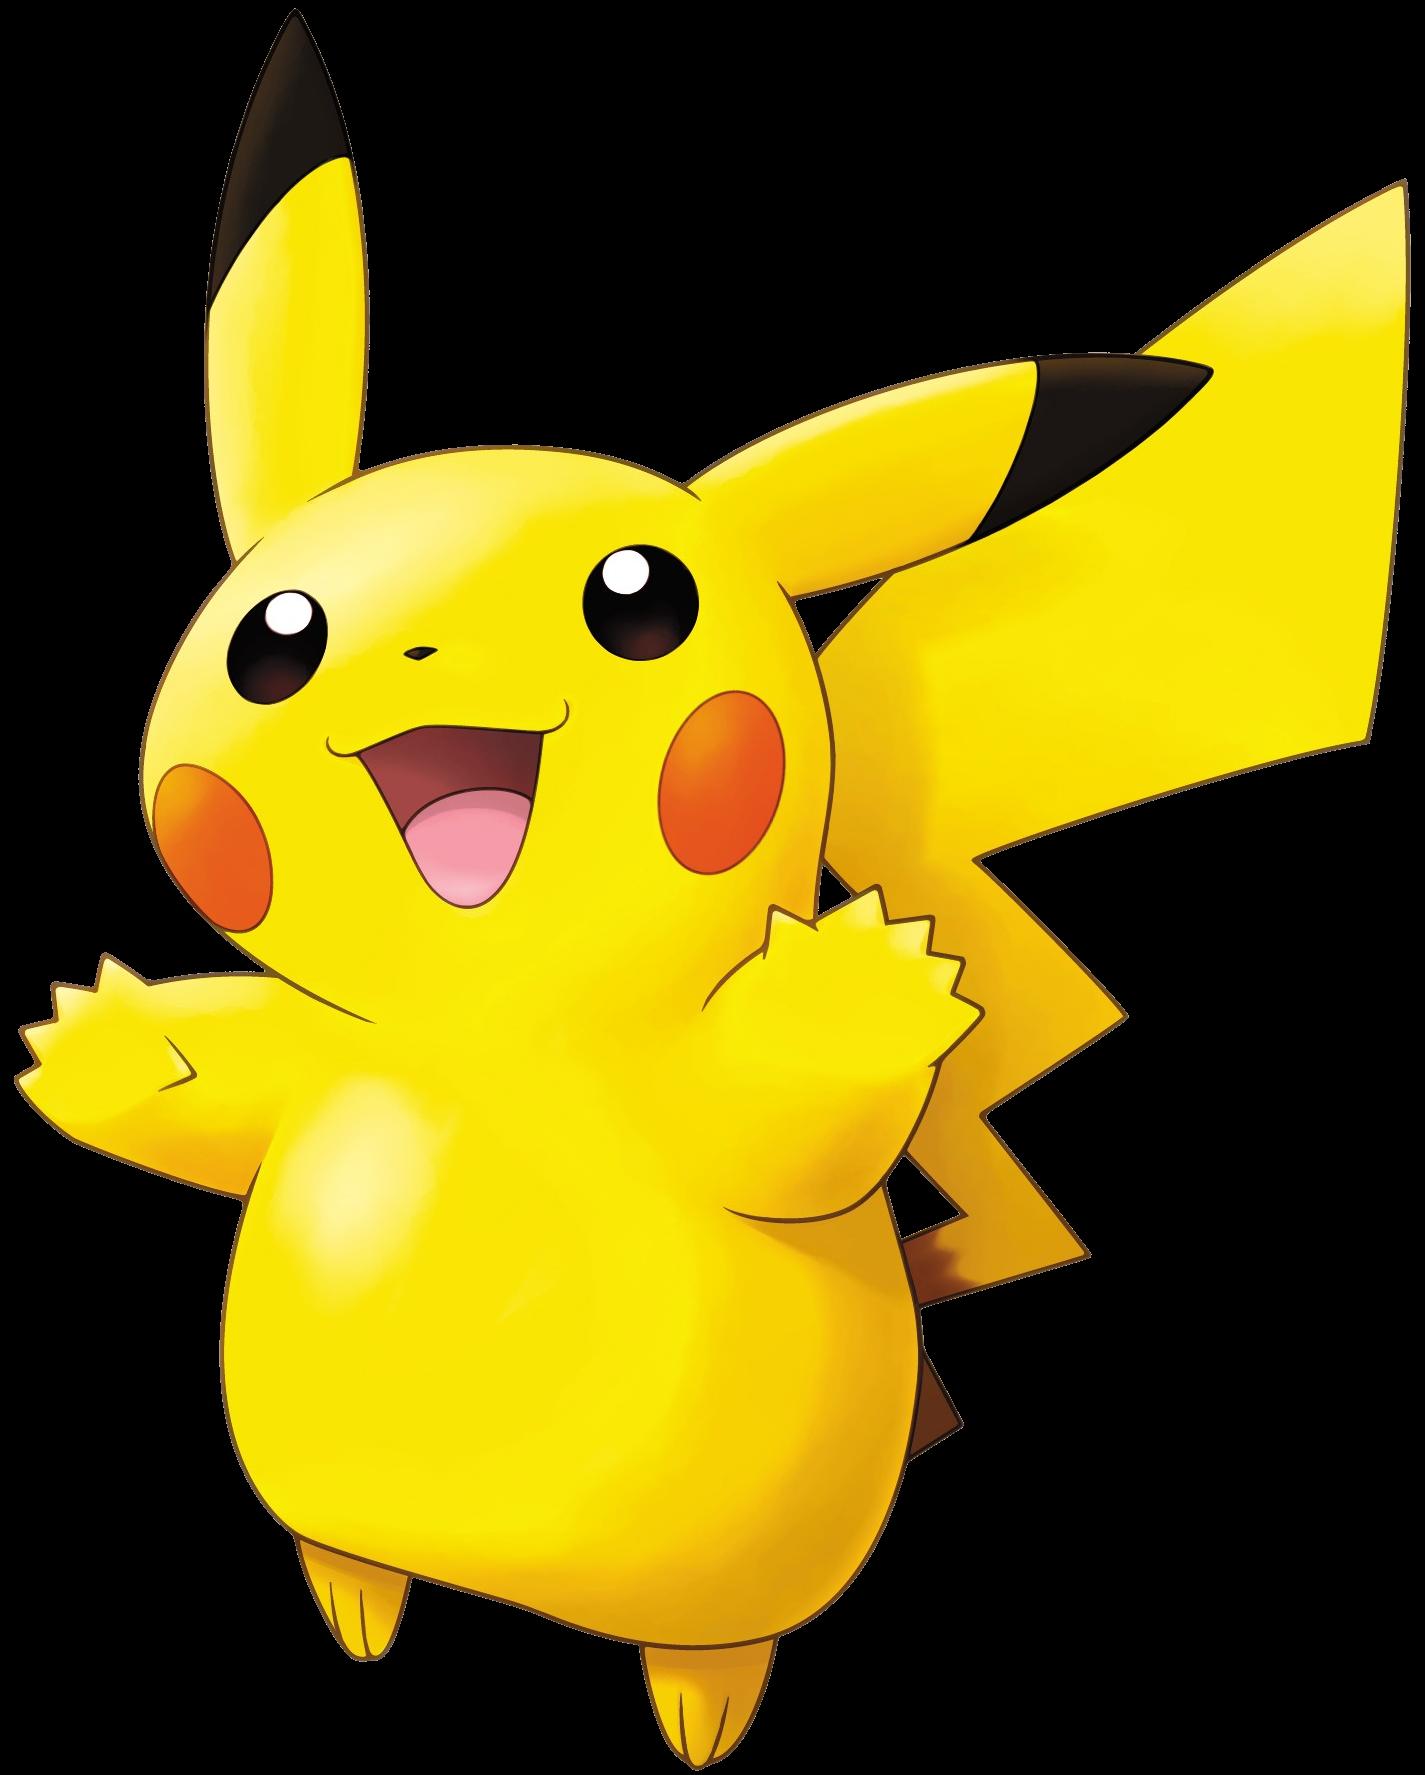 Pikachu clipart file, Pikachu file Transparent FREE for ...